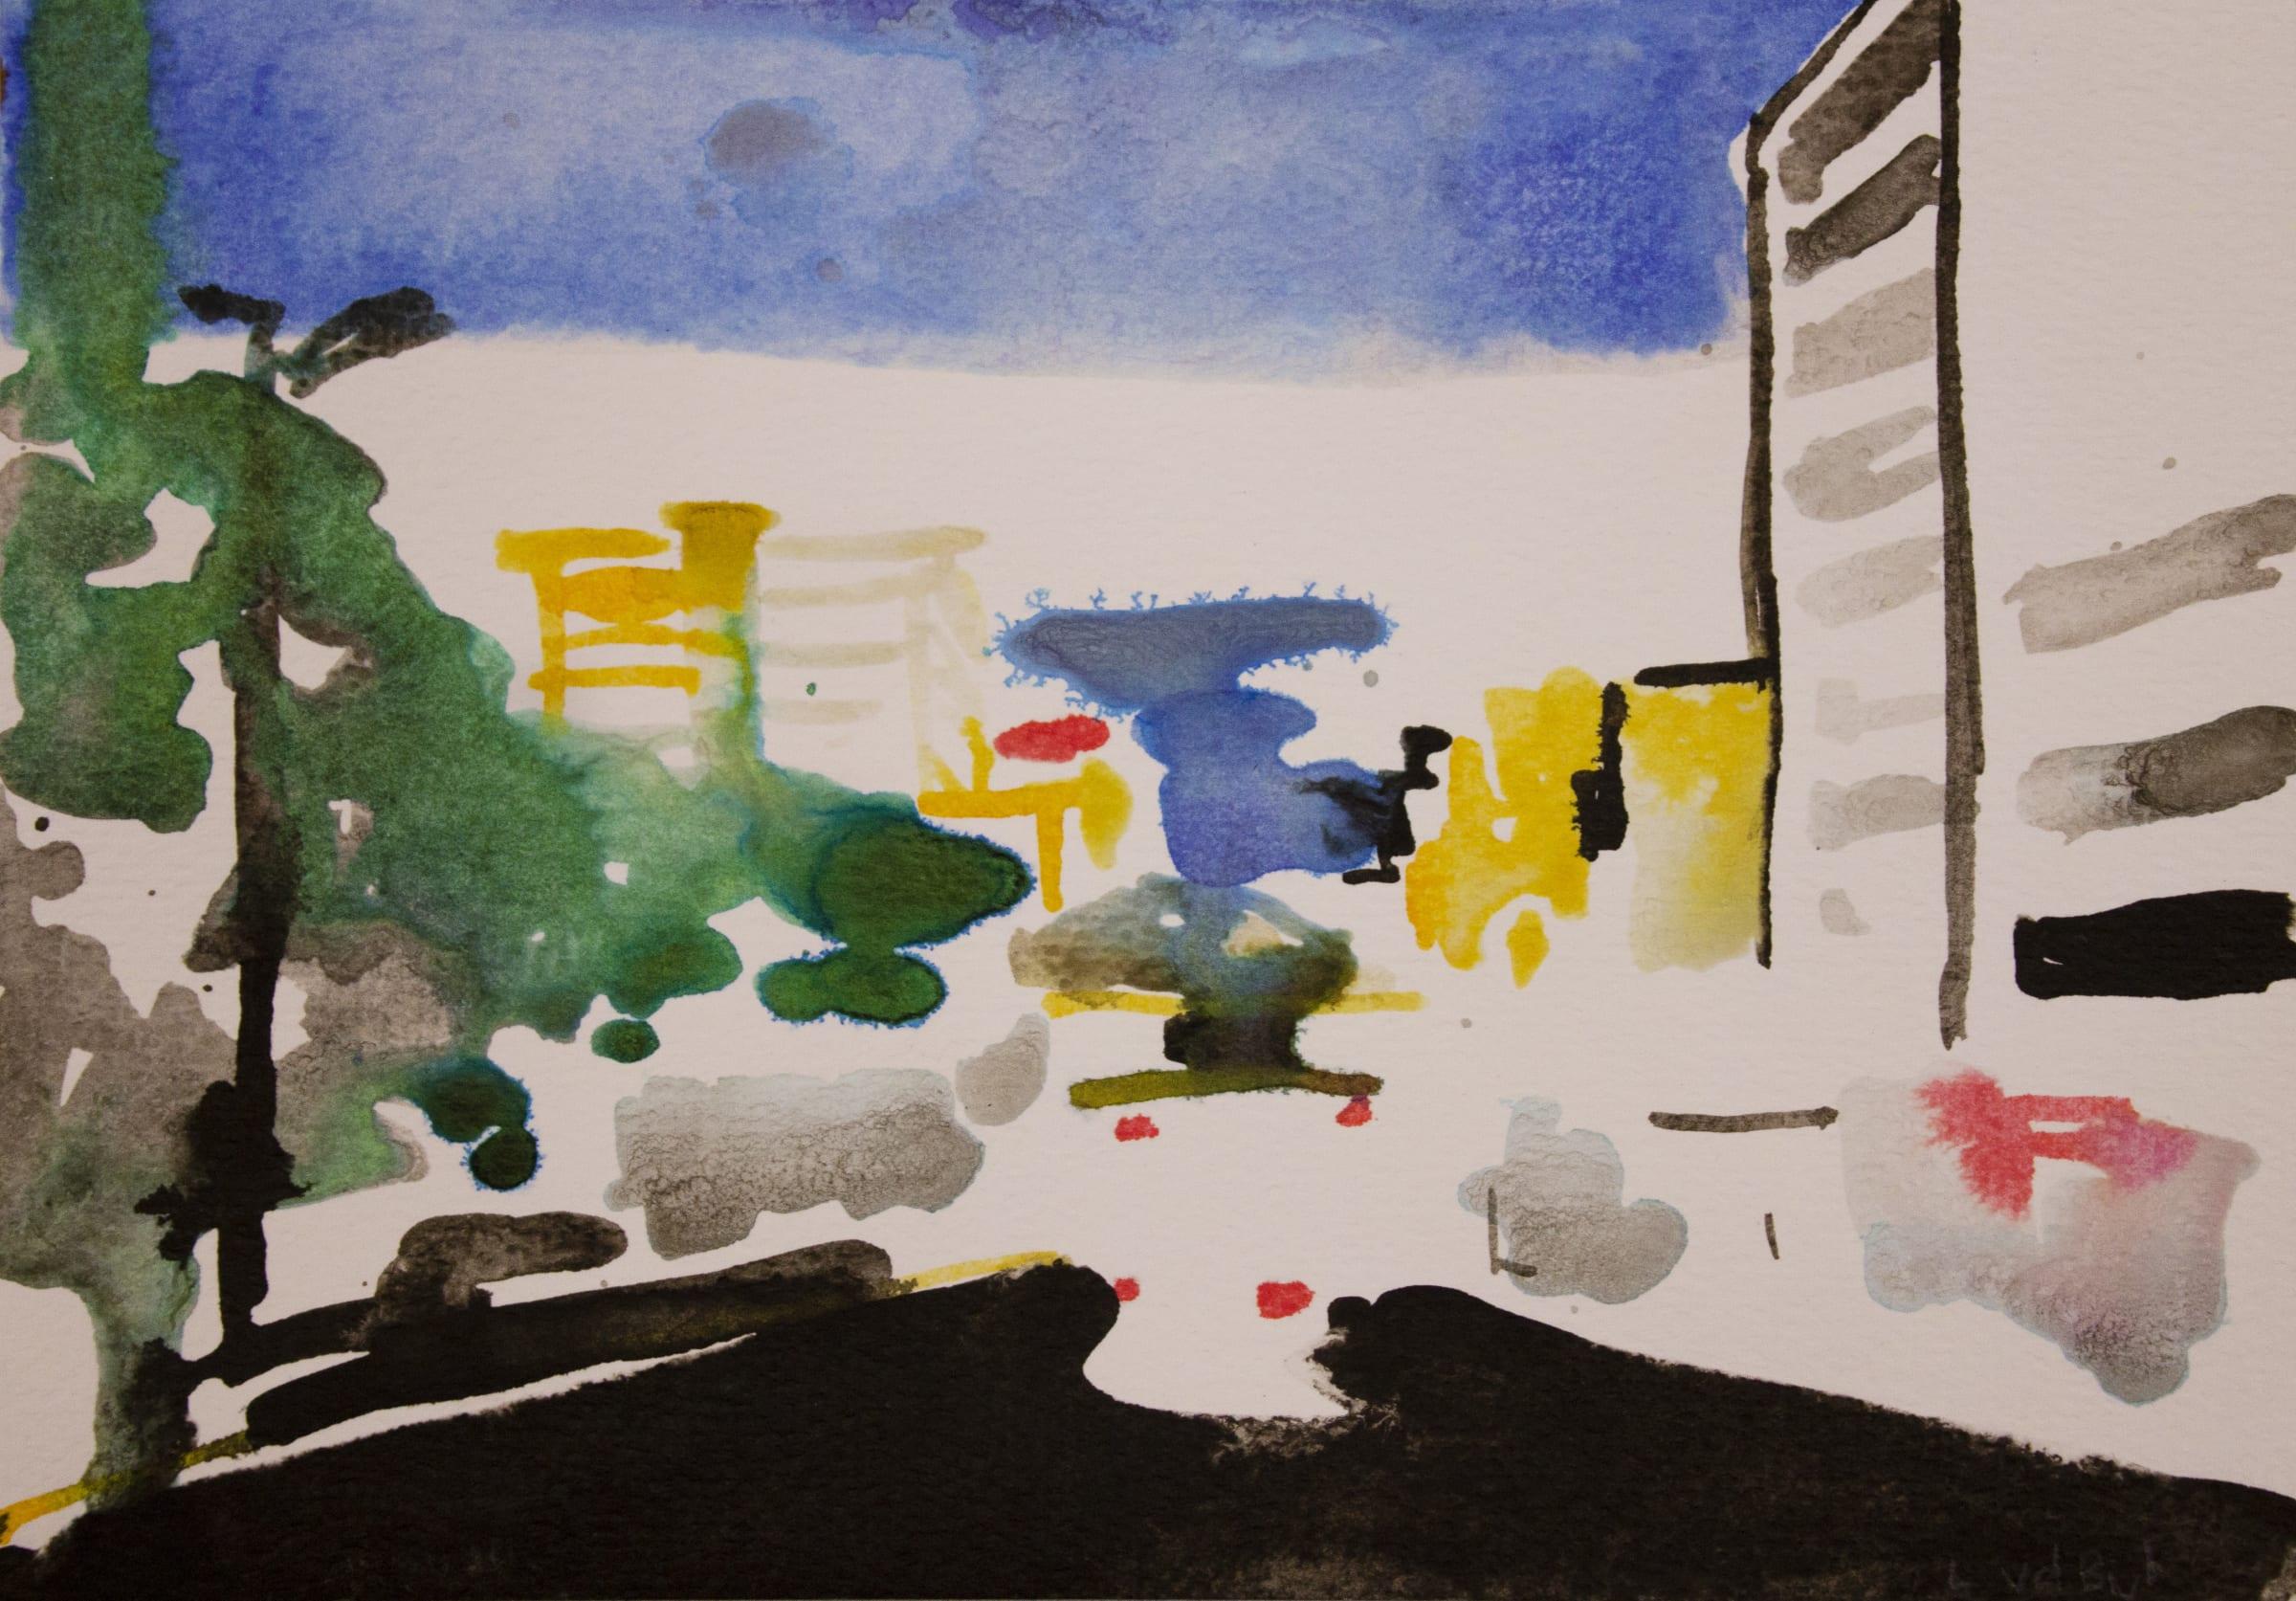 <span class=&#34;link fancybox-details-link&#34;><a href=&#34;/artists/88-louise-van-der-bijl/works/2299-louise-van-der-bijl-inktober-day-7-2018/&#34;>View Detail Page</a></span><div class=&#34;artist&#34;><strong>Louise Van Der Bijl</strong></div> <div class=&#34;title&#34;><em>Inktober Day 7</em>, 2018</div> <div class=&#34;medium&#34;>Ink On Paper</div> <div class=&#34;dimensions&#34;>15cm x 21cm</div><div class=&#34;price&#34;>R400.00</div>